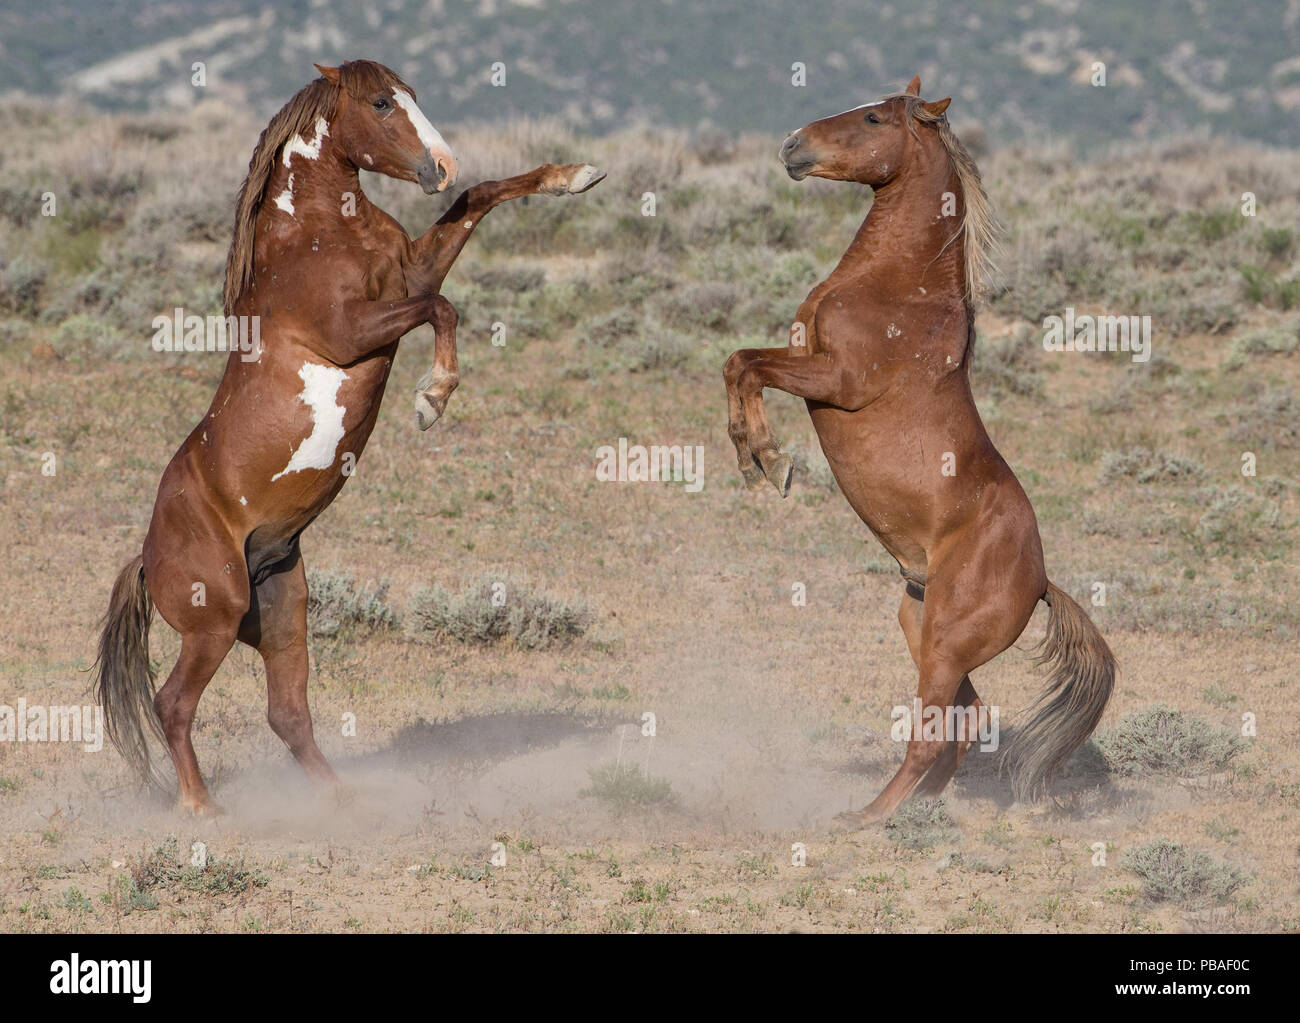 Zwei wilde Mustang pinto Hengste Kampf um die Dominanz im Sand Wash Basin, Colorado, USA. Stockbild